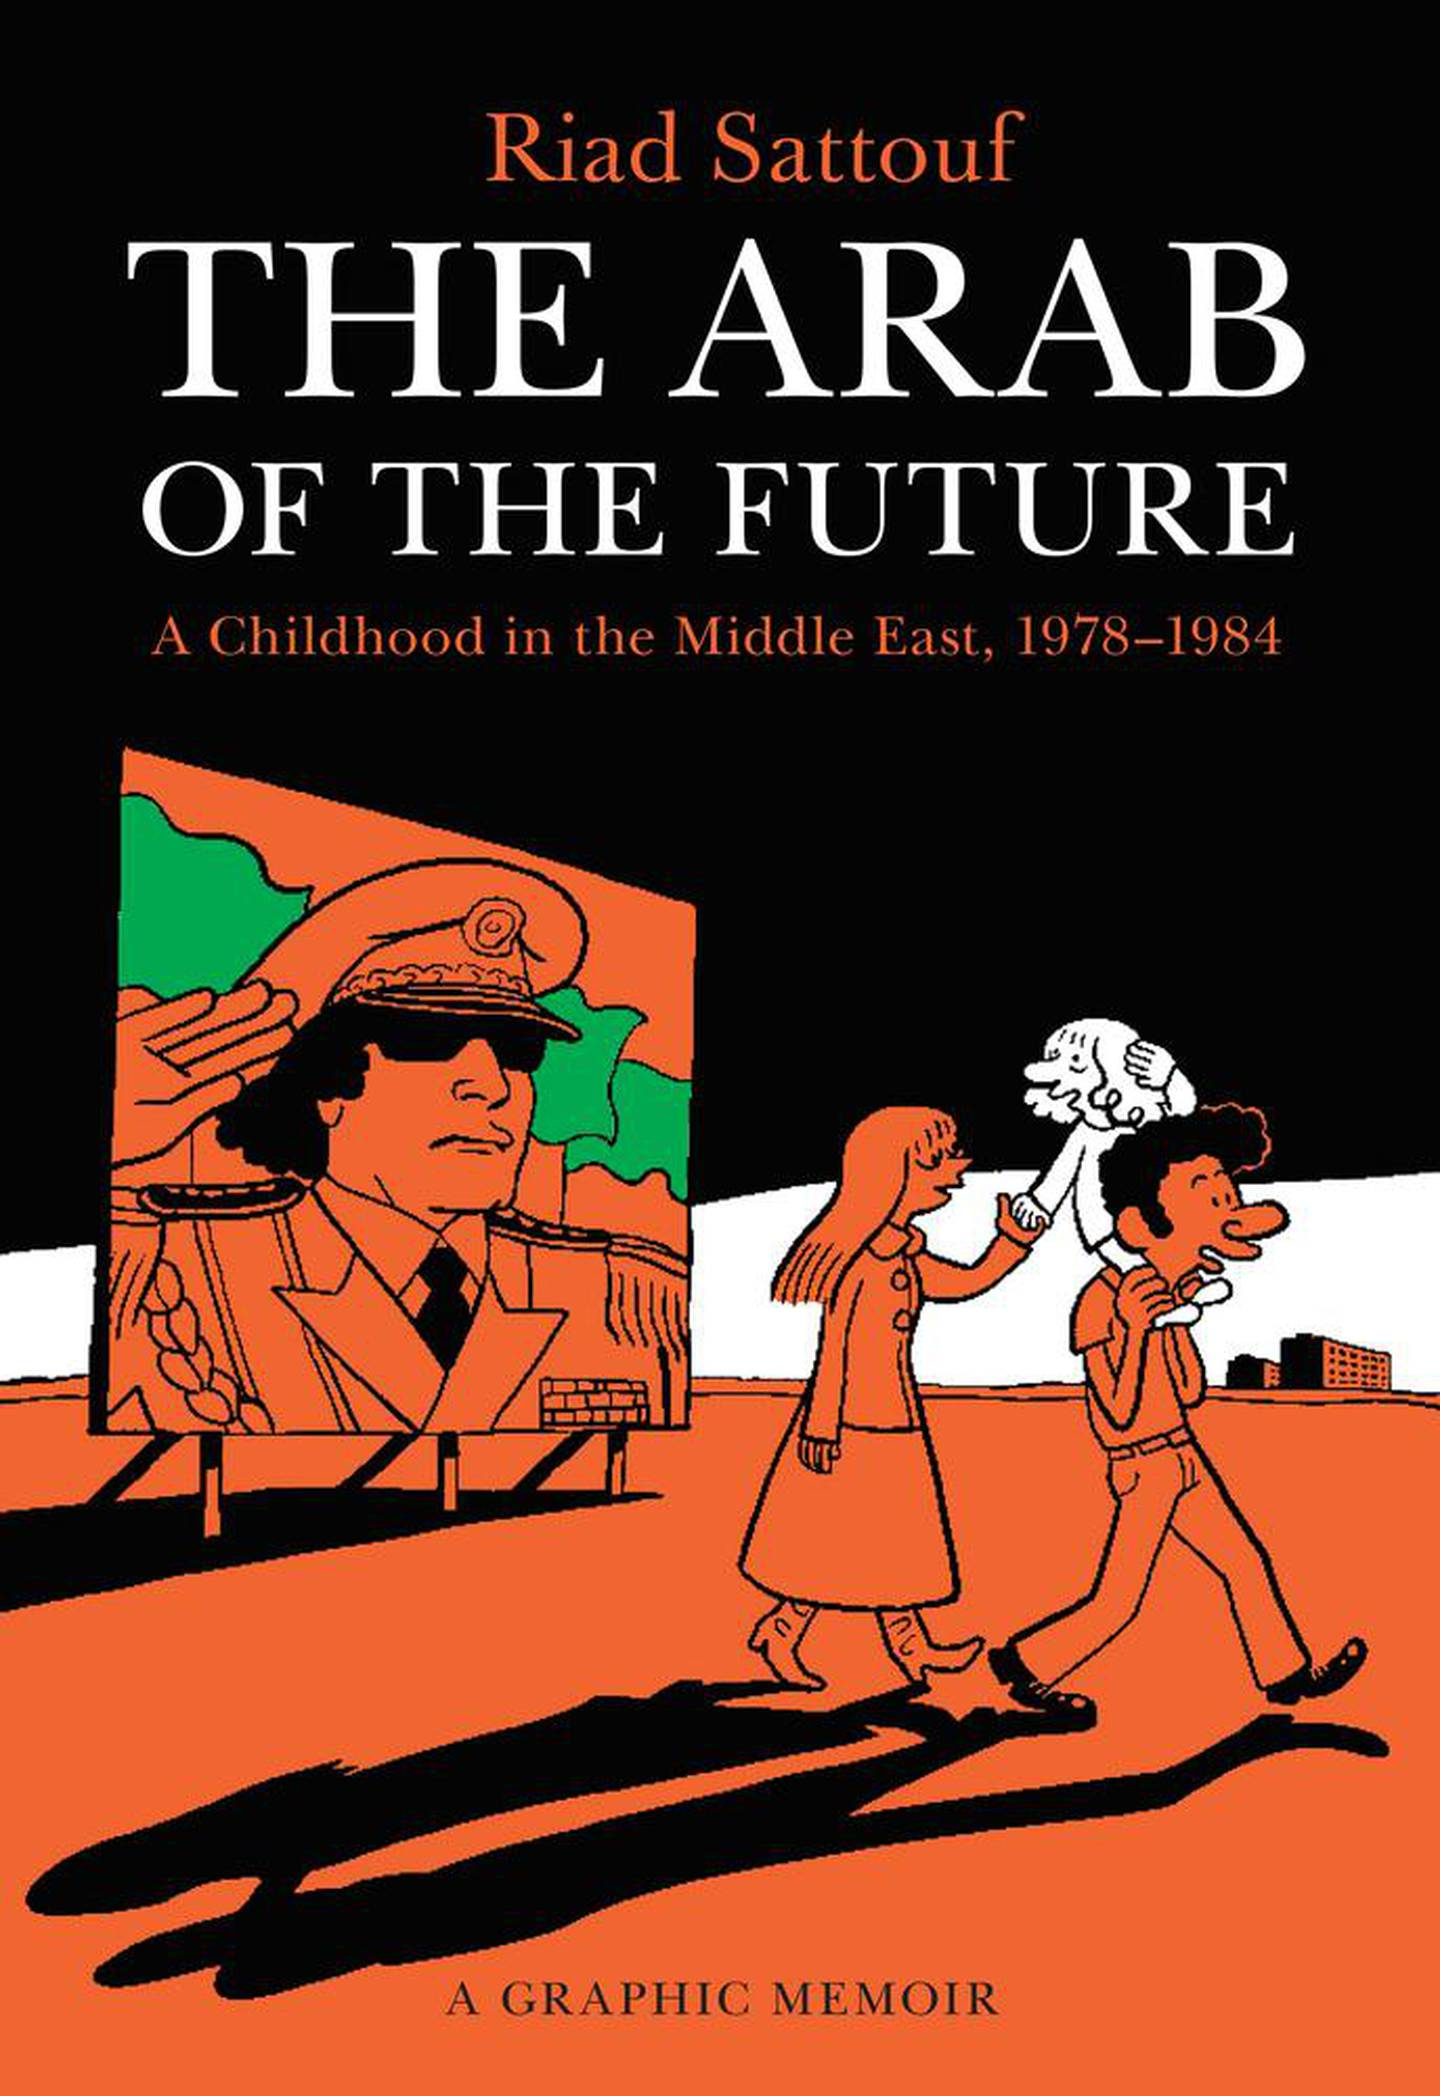 The Arab of the Future by Riad Sattouf. Courtesy Metropolitan Books